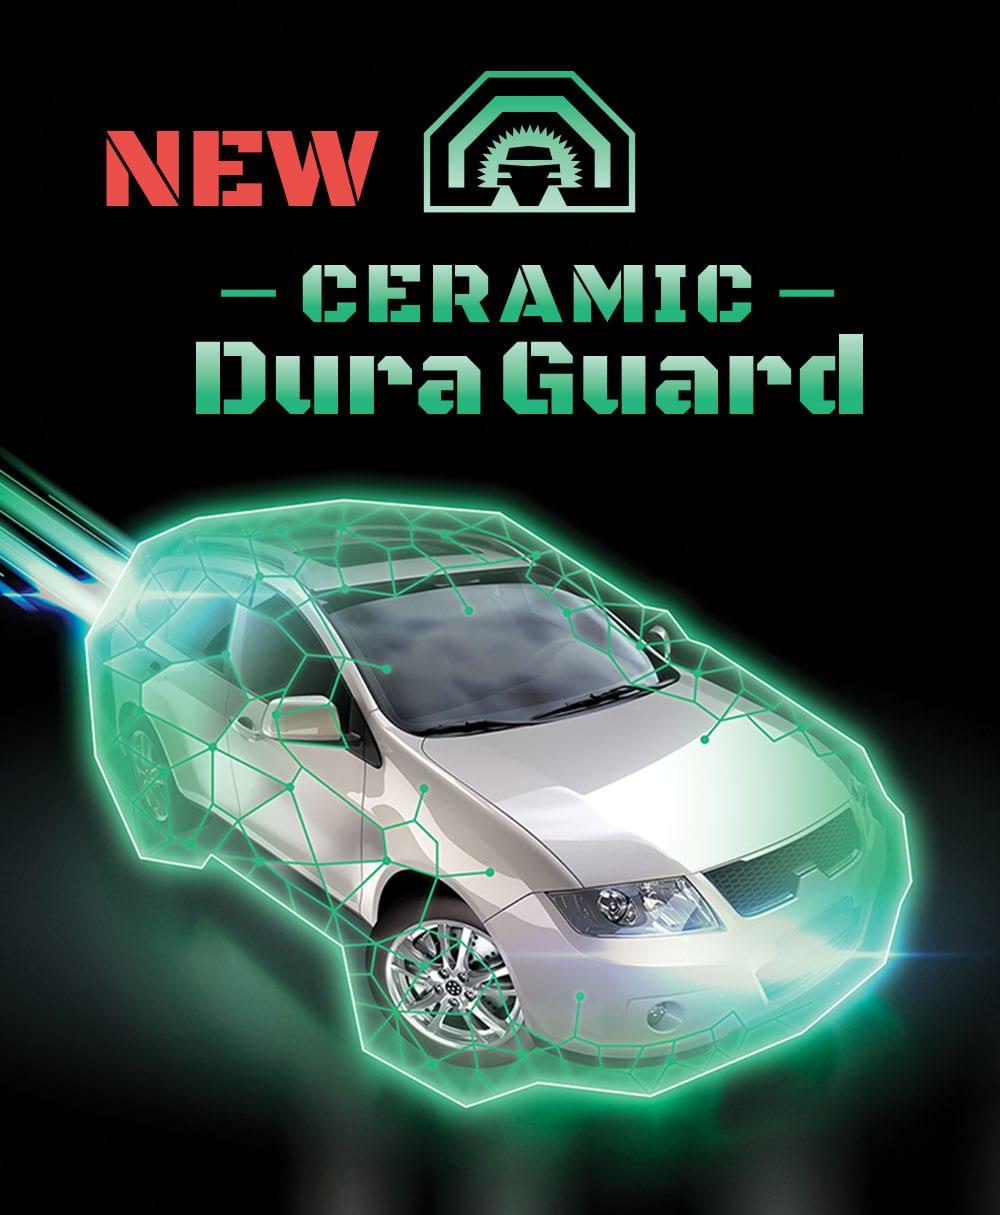 news ceramic dura guard 2020 04